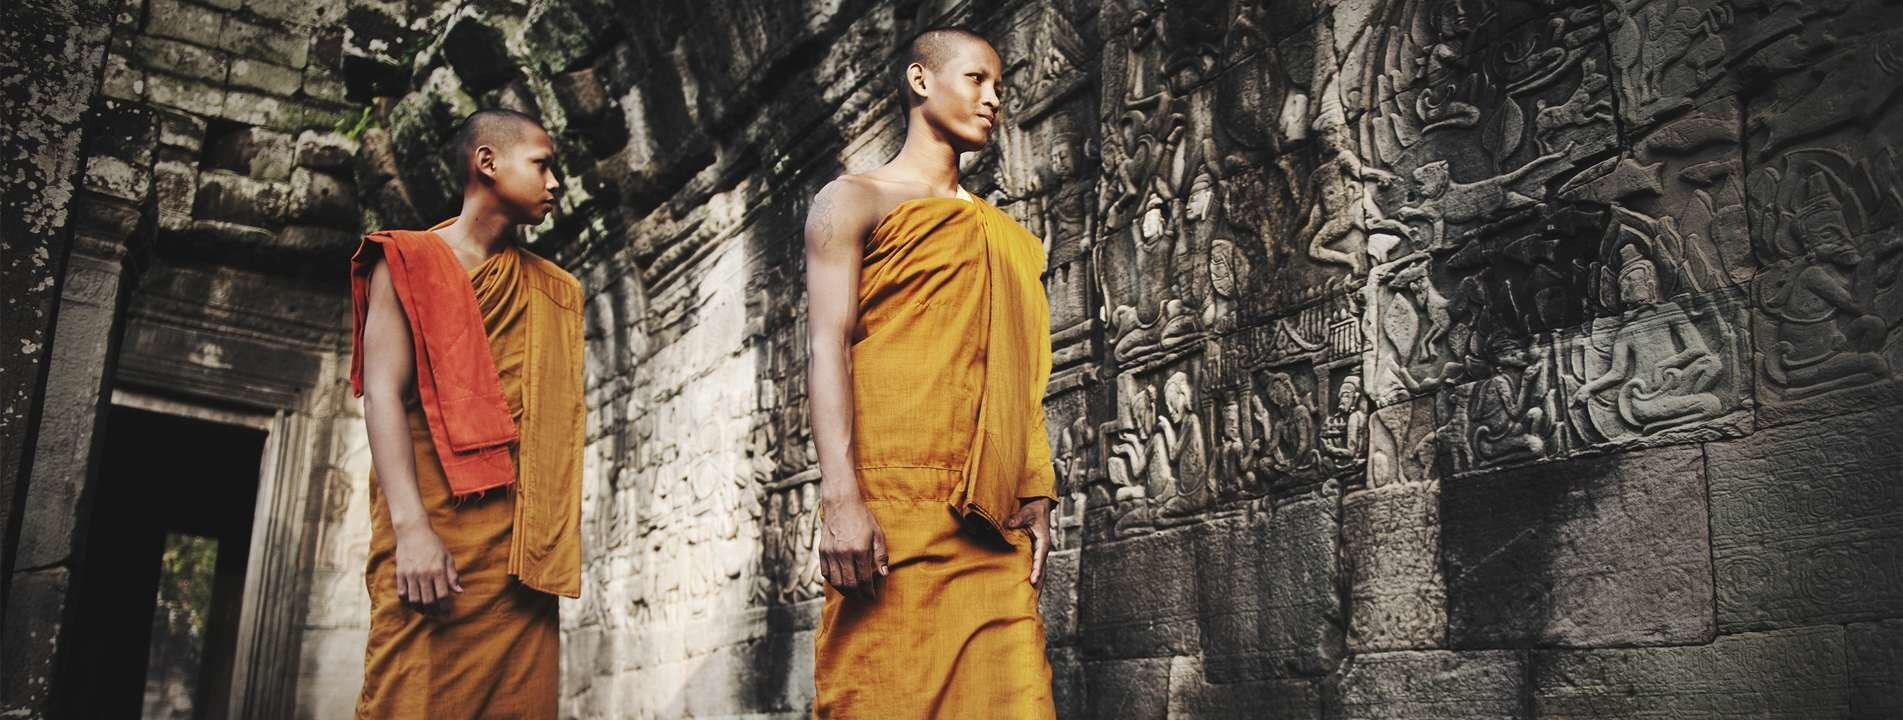 5-Day Siem Reap Tour in Depth